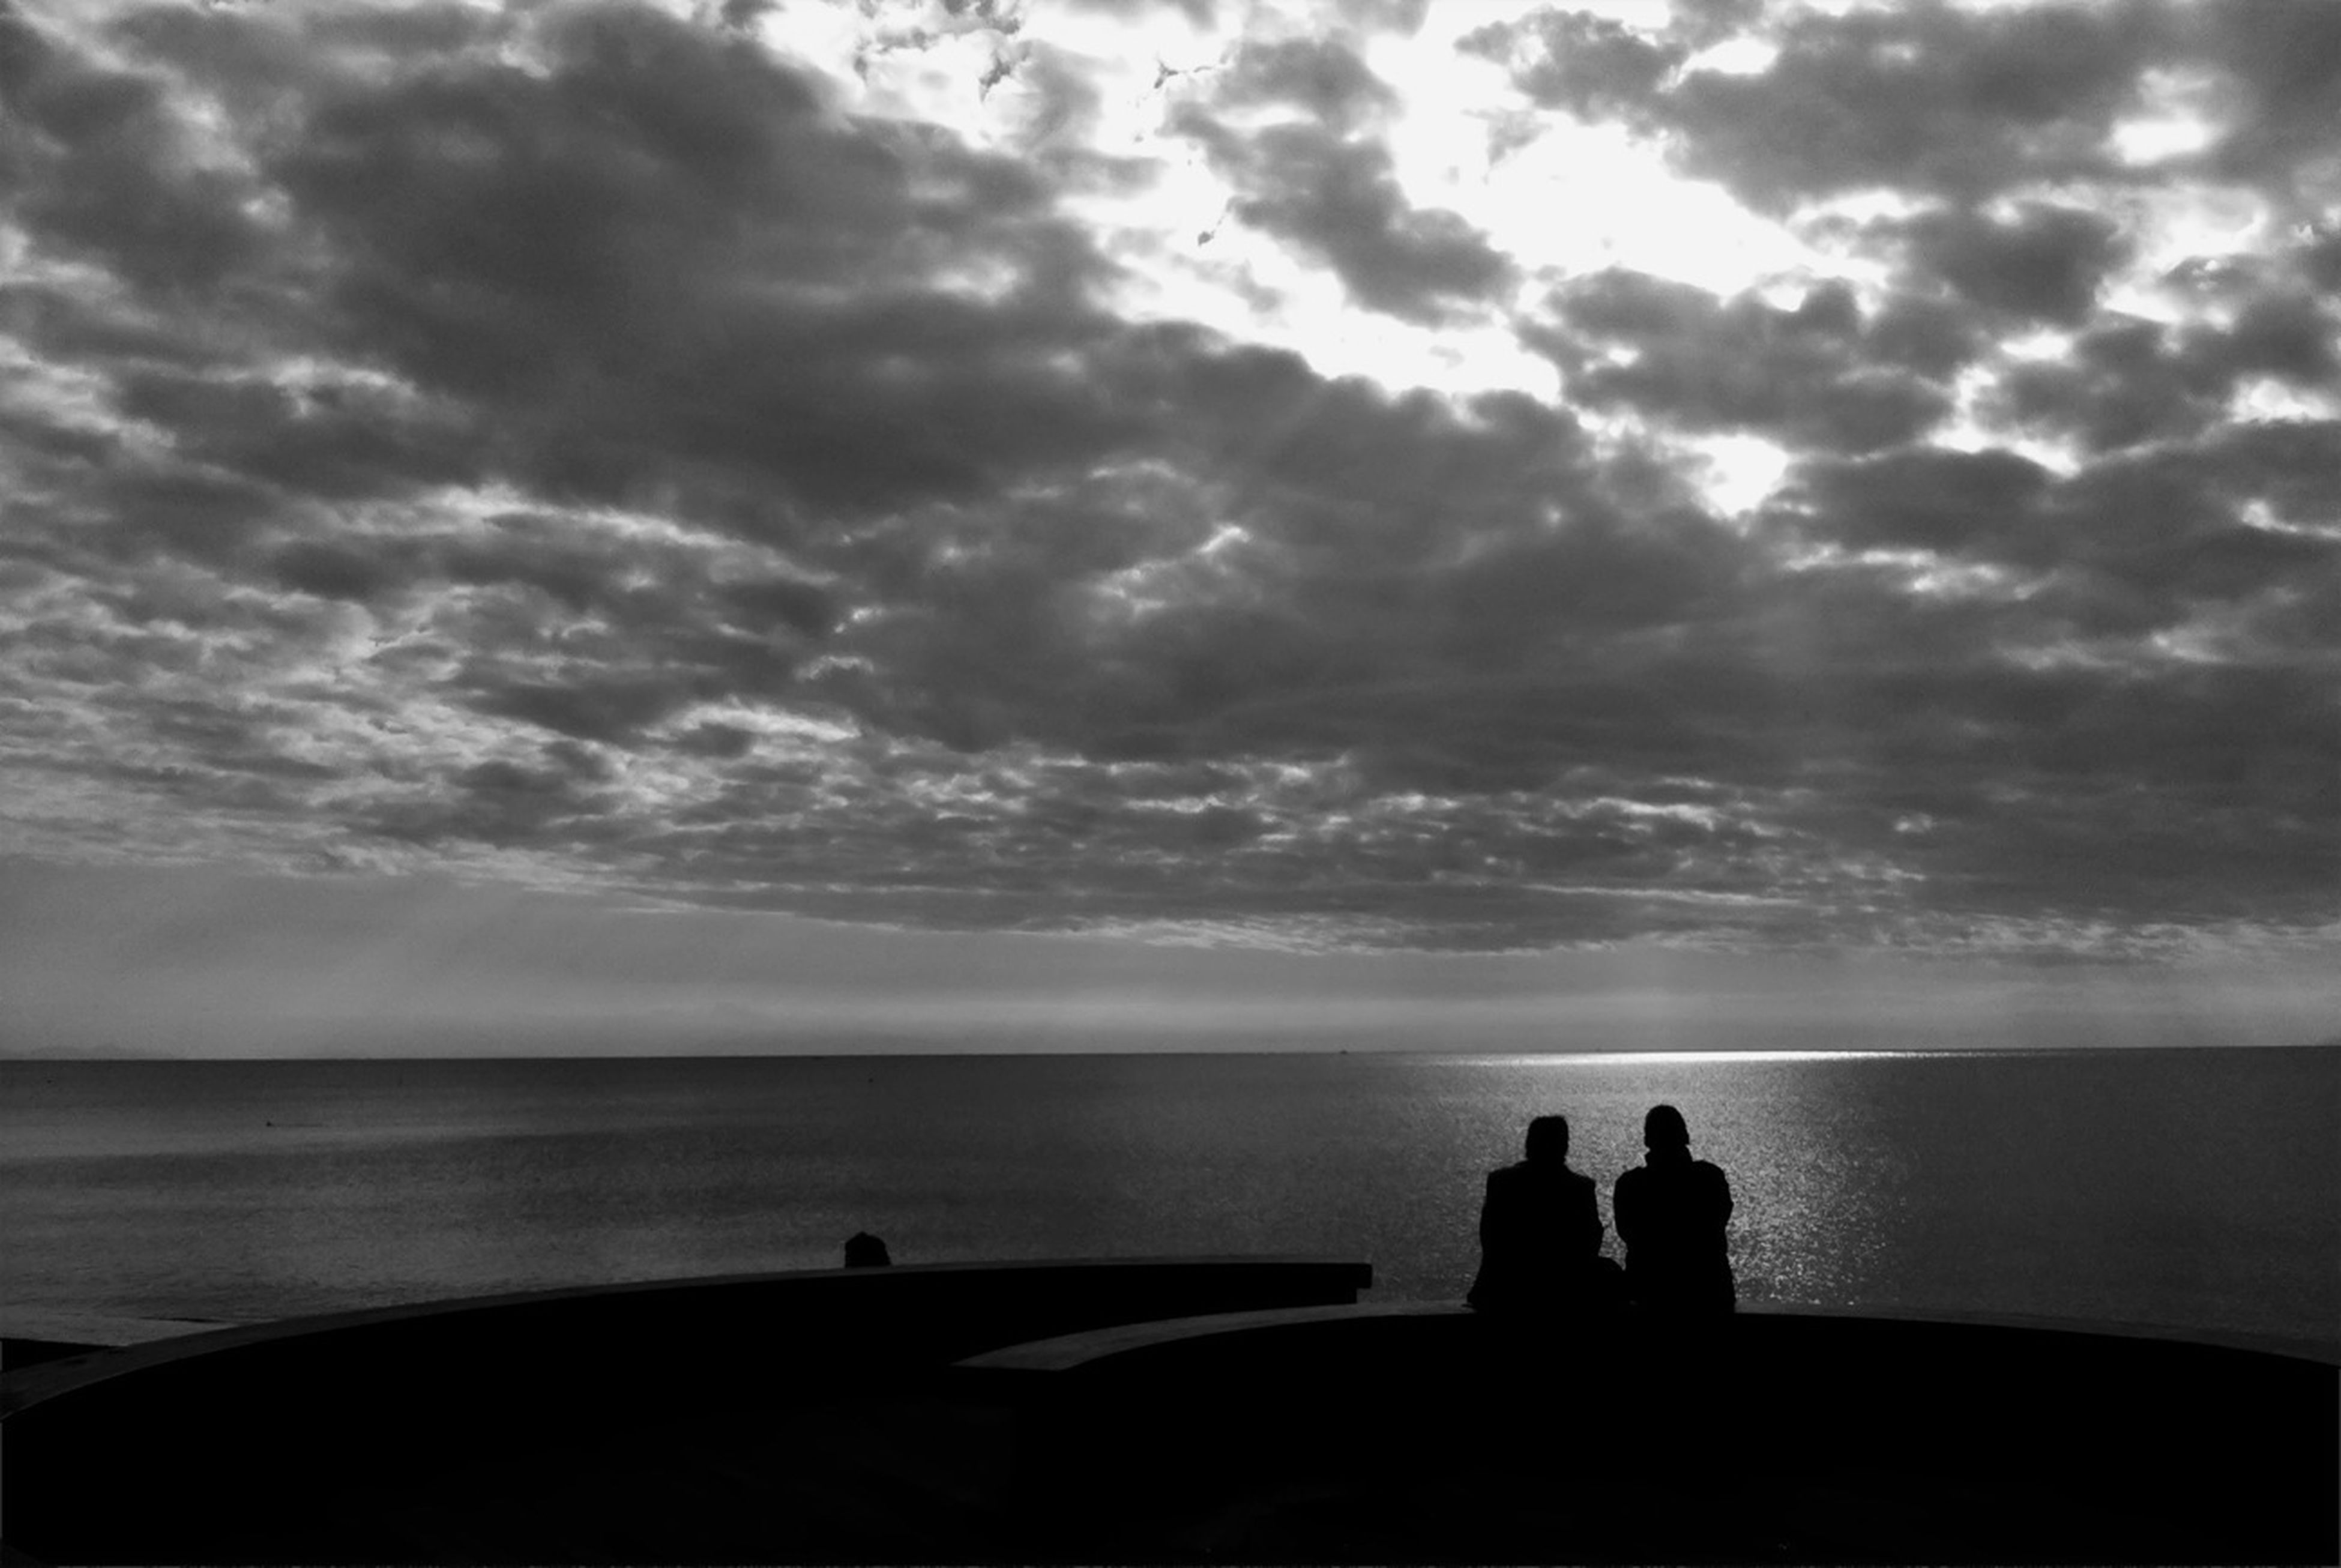 sea, horizon over water, sky, silhouette, water, cloud - sky, scenics, beauty in nature, tranquil scene, tranquility, beach, cloudy, nature, cloud, sunset, idyllic, shore, men, unrecognizable person